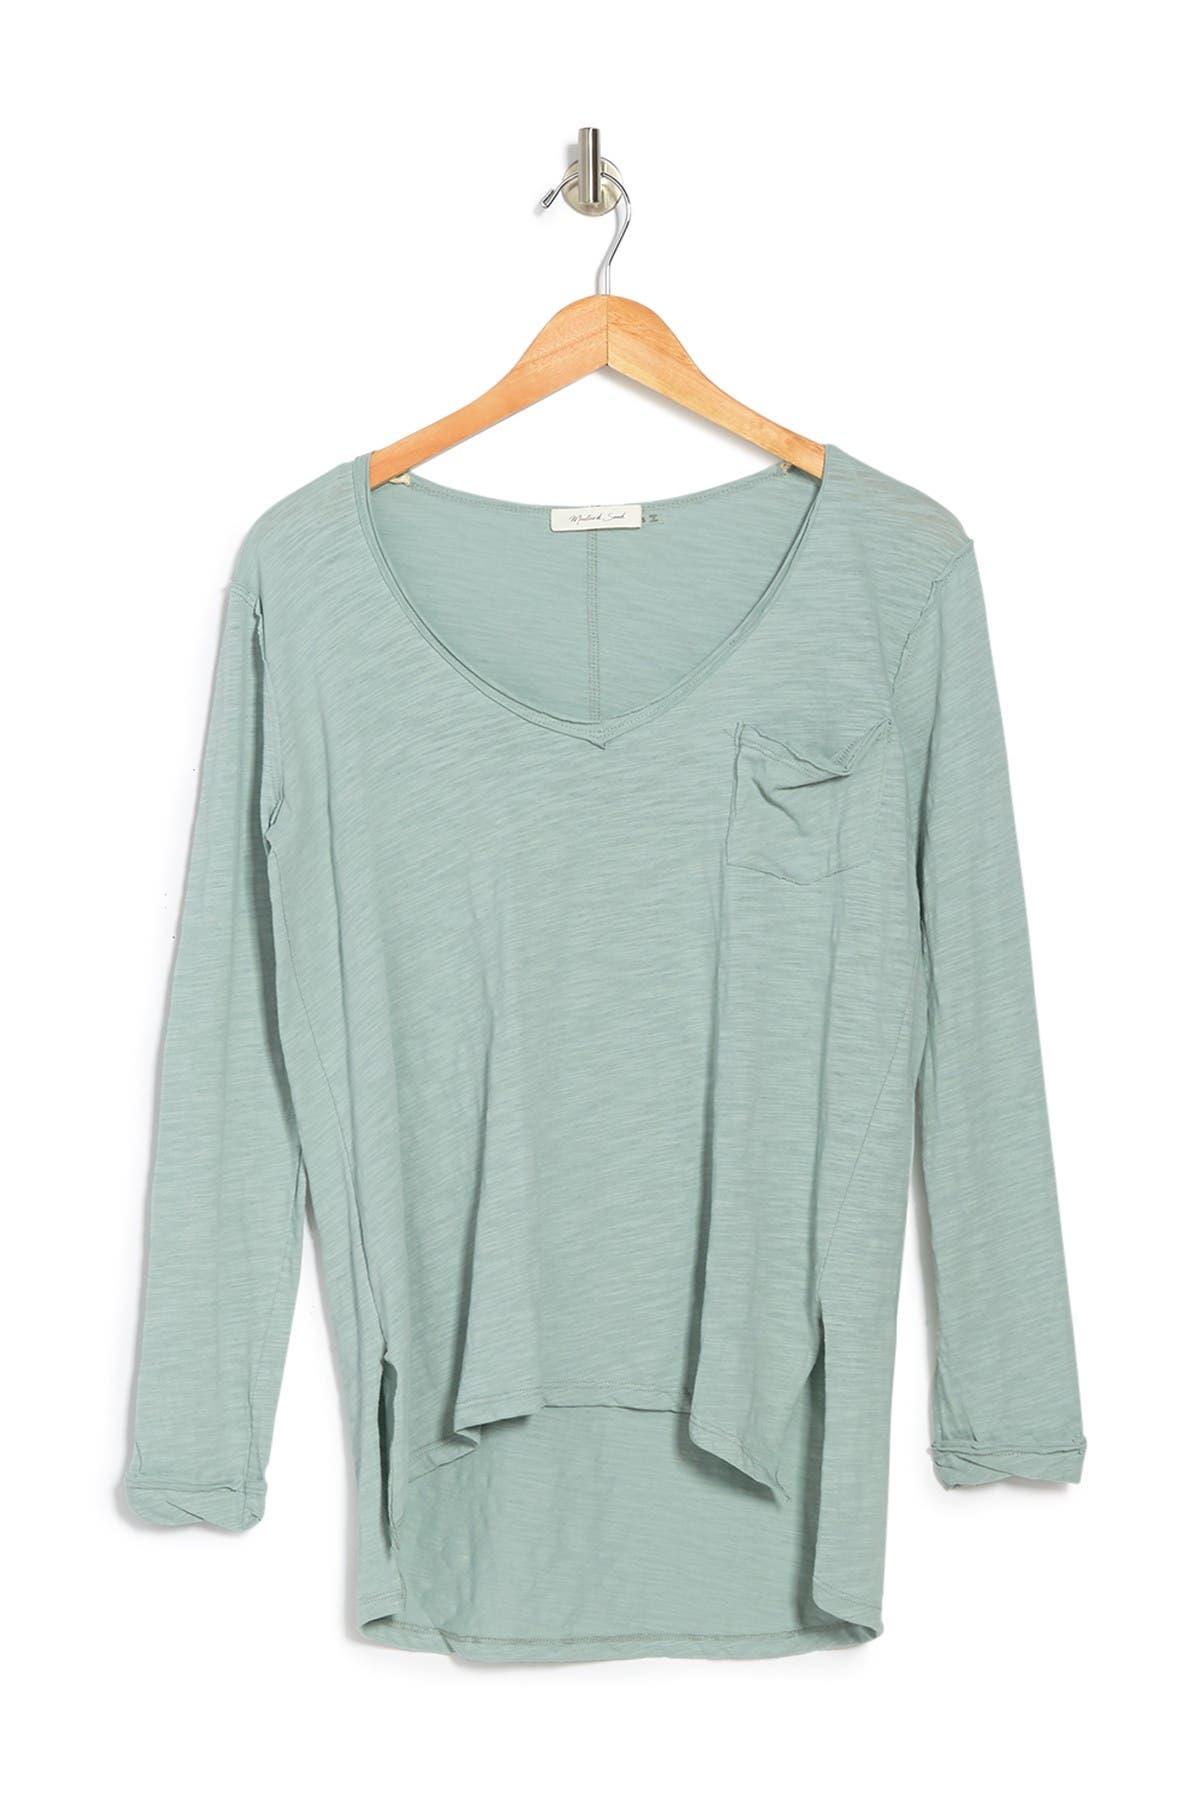 Image of Mustard Seed Basic Long Sleeve T-Shirt